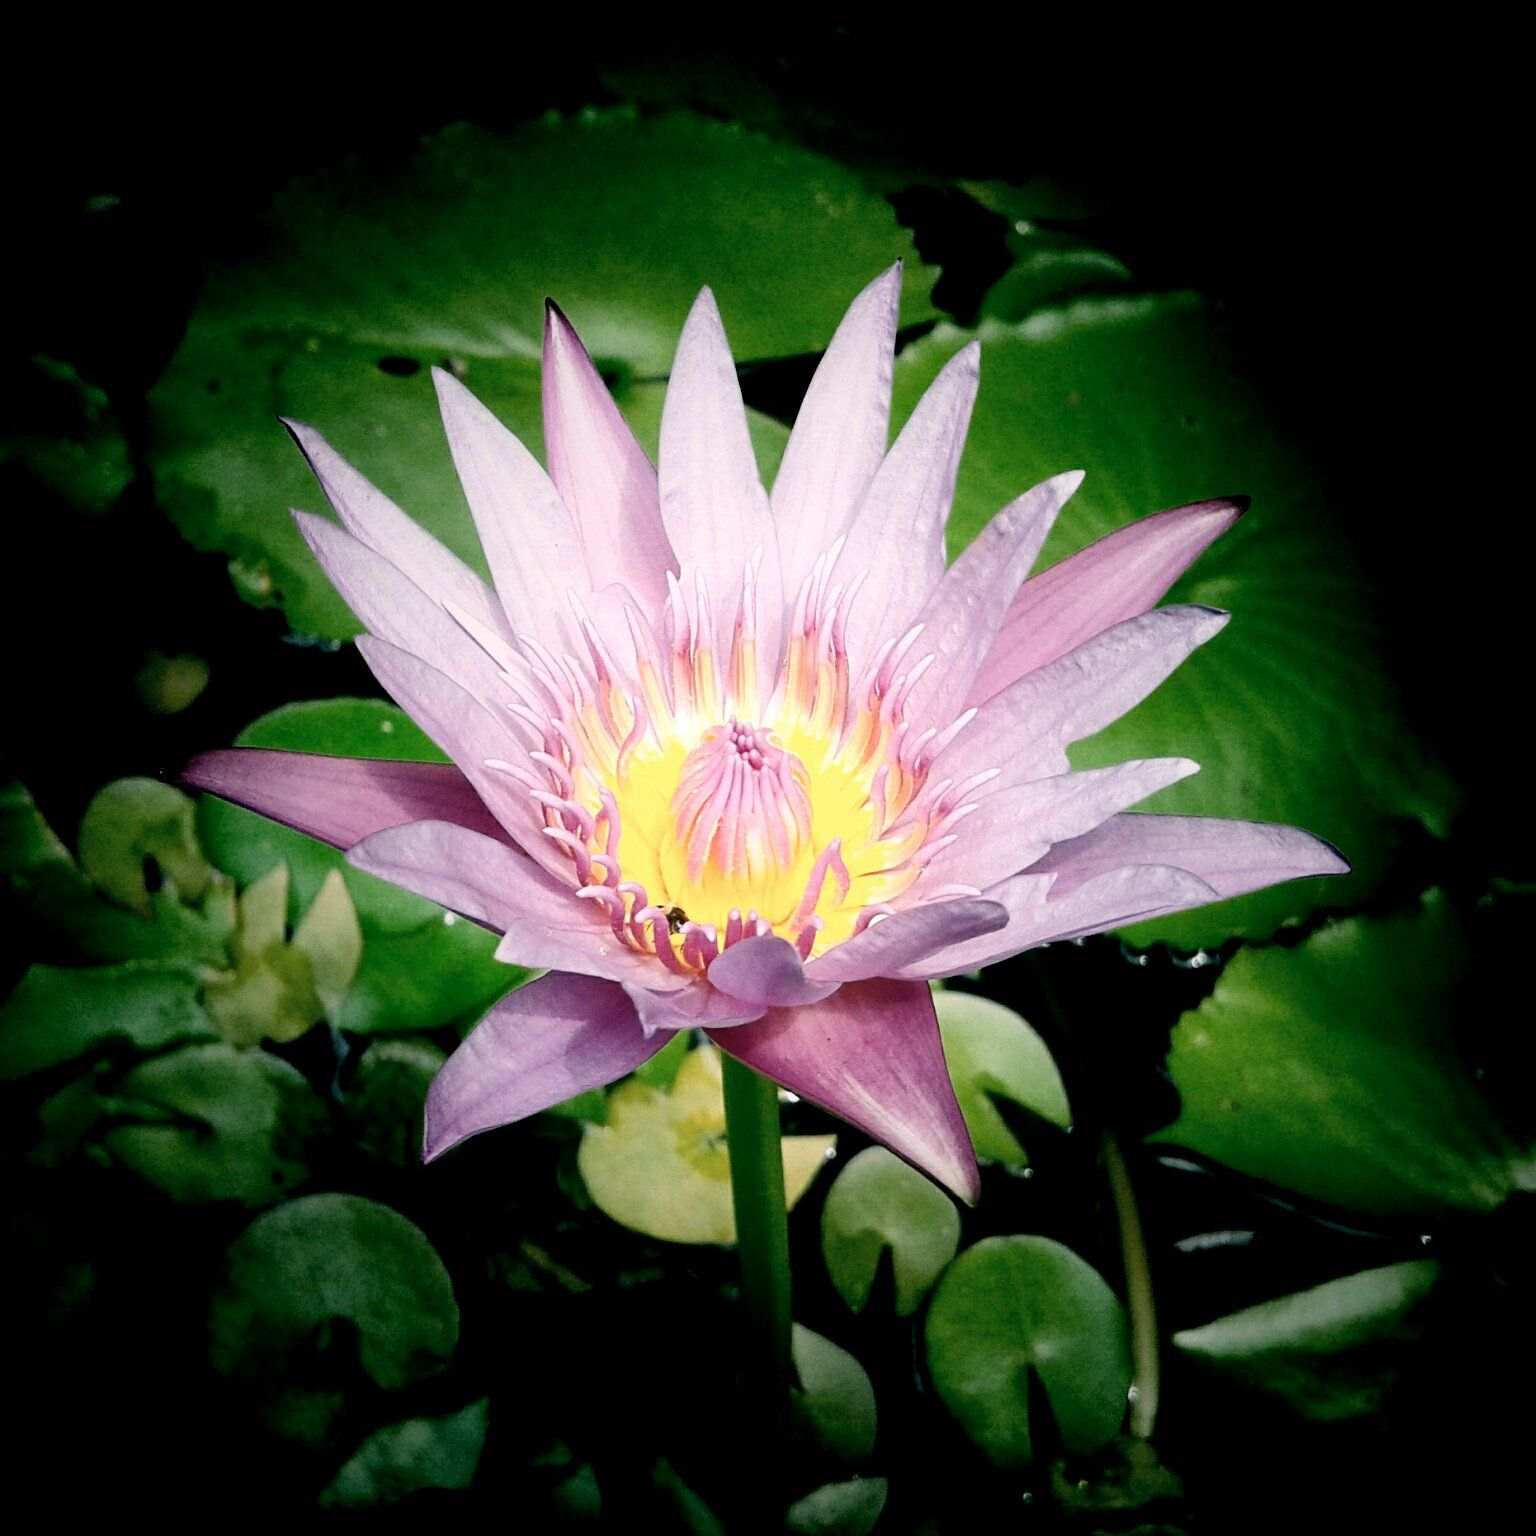 Lotus, Bogor Botanical Garden, Indonesia Water lilies